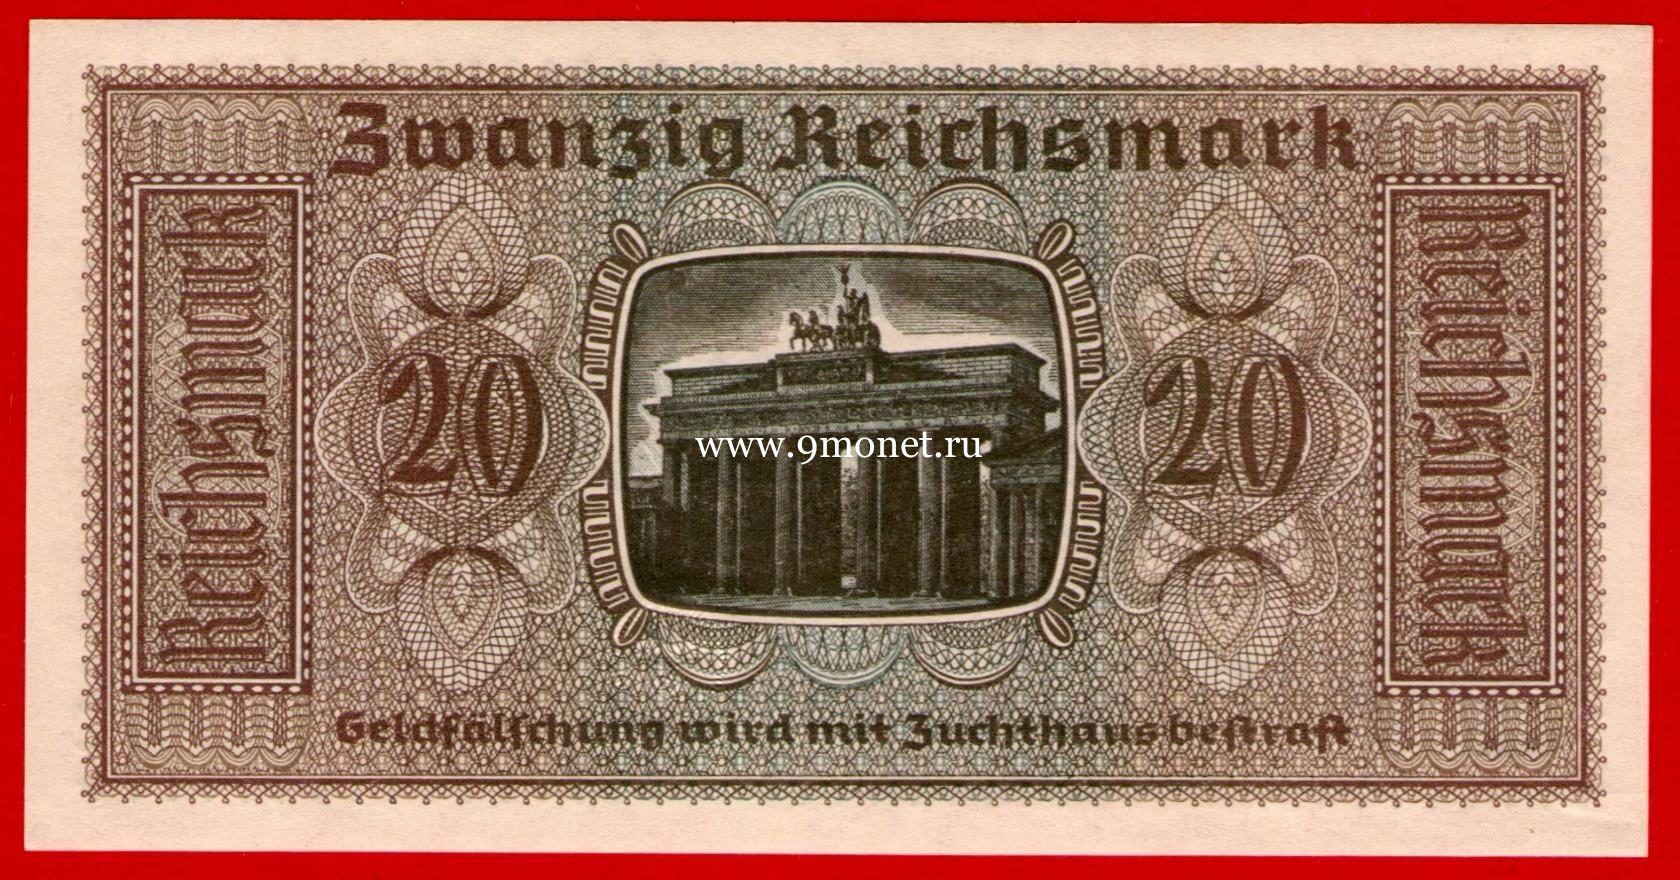 Германия 1939 год. Банкнота 20 рейхсмарок.